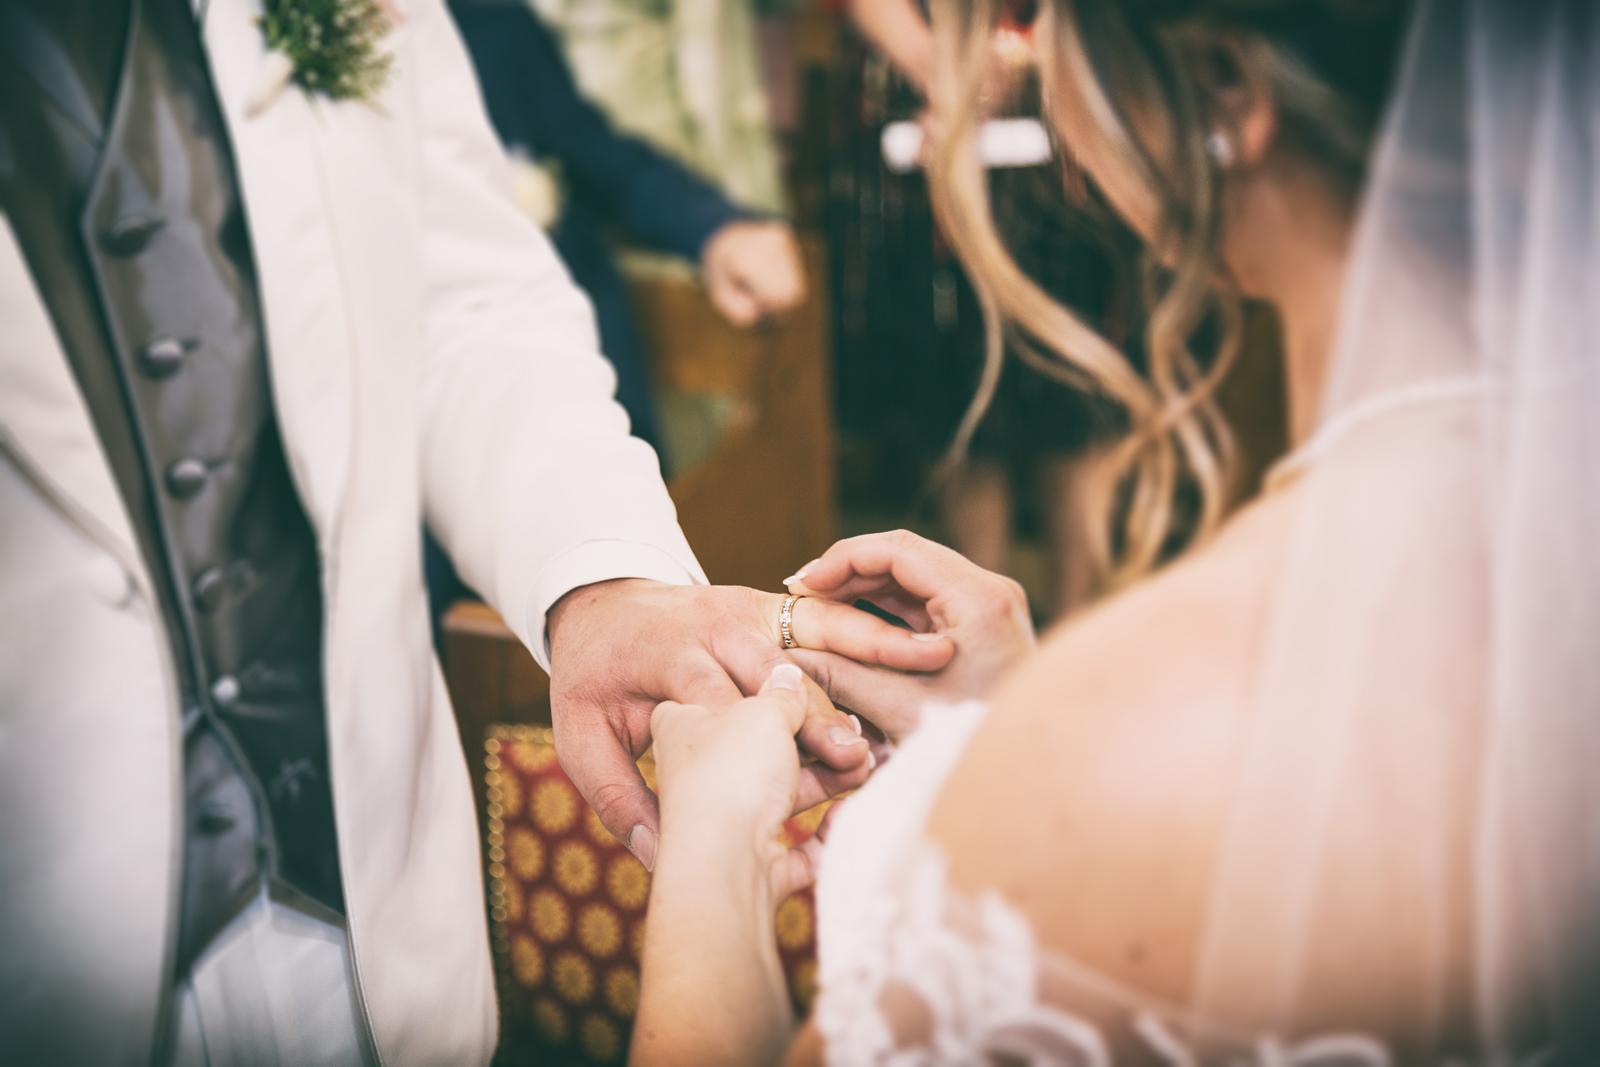 photographe de mariage, consentements